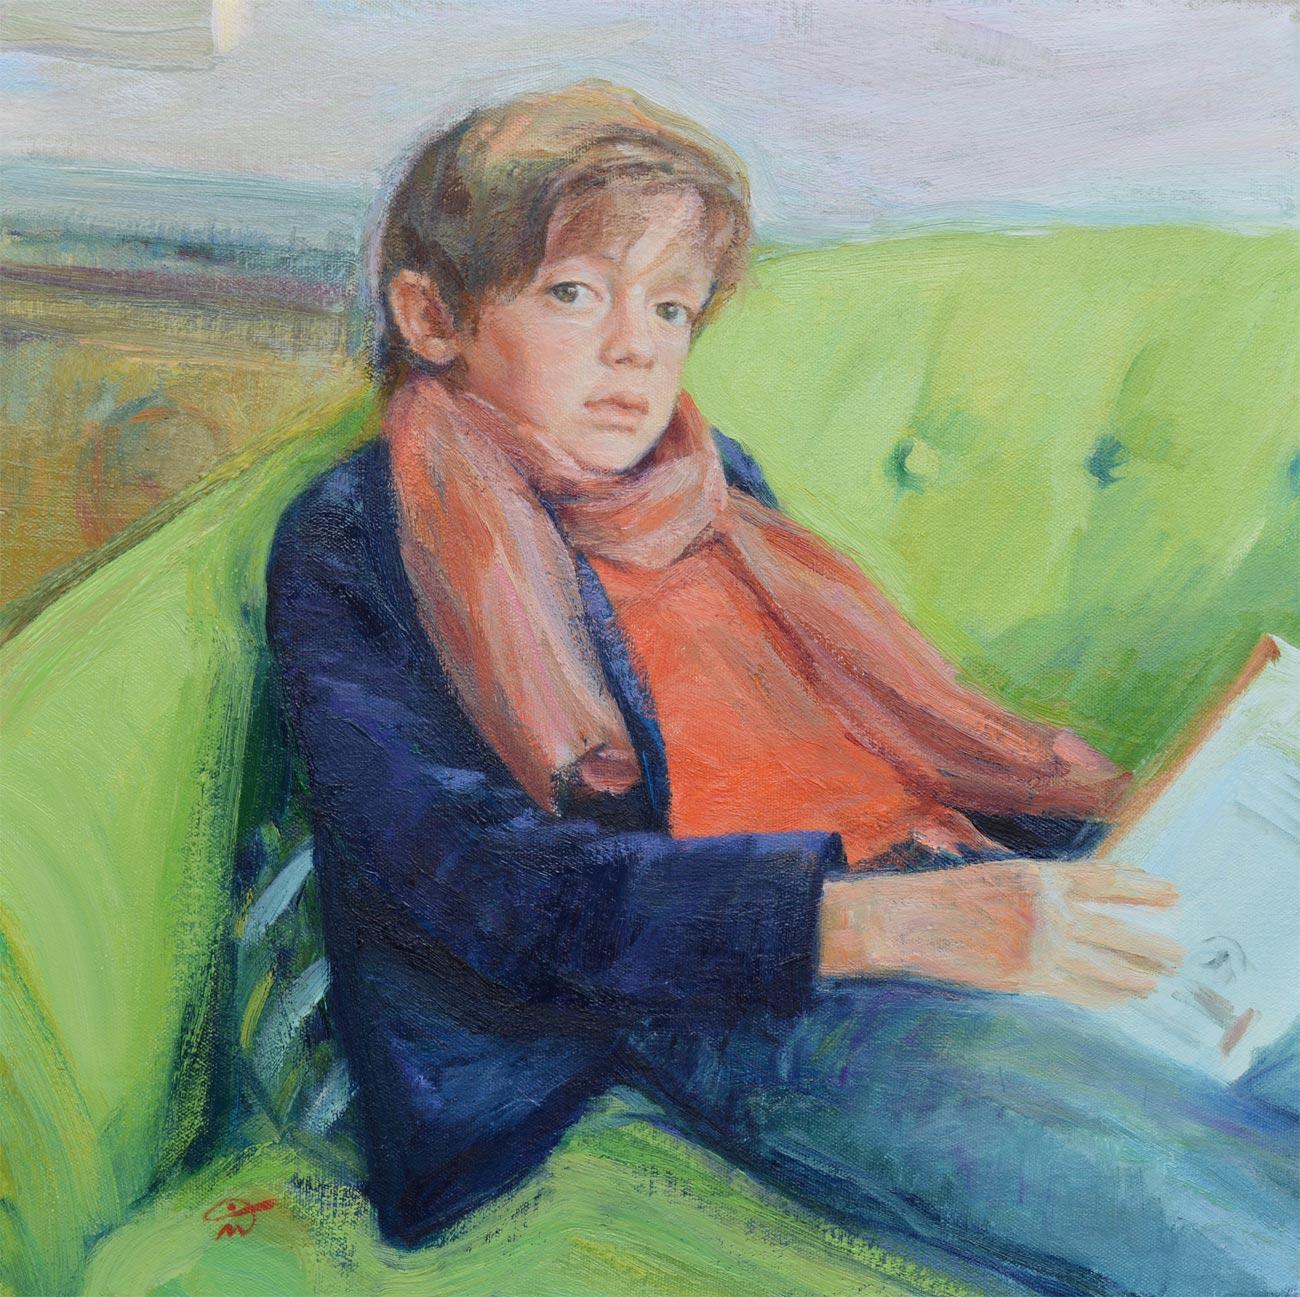 Portrait of Hugh. Oil on canvas. Portrait commission by the British artist Marina Kim